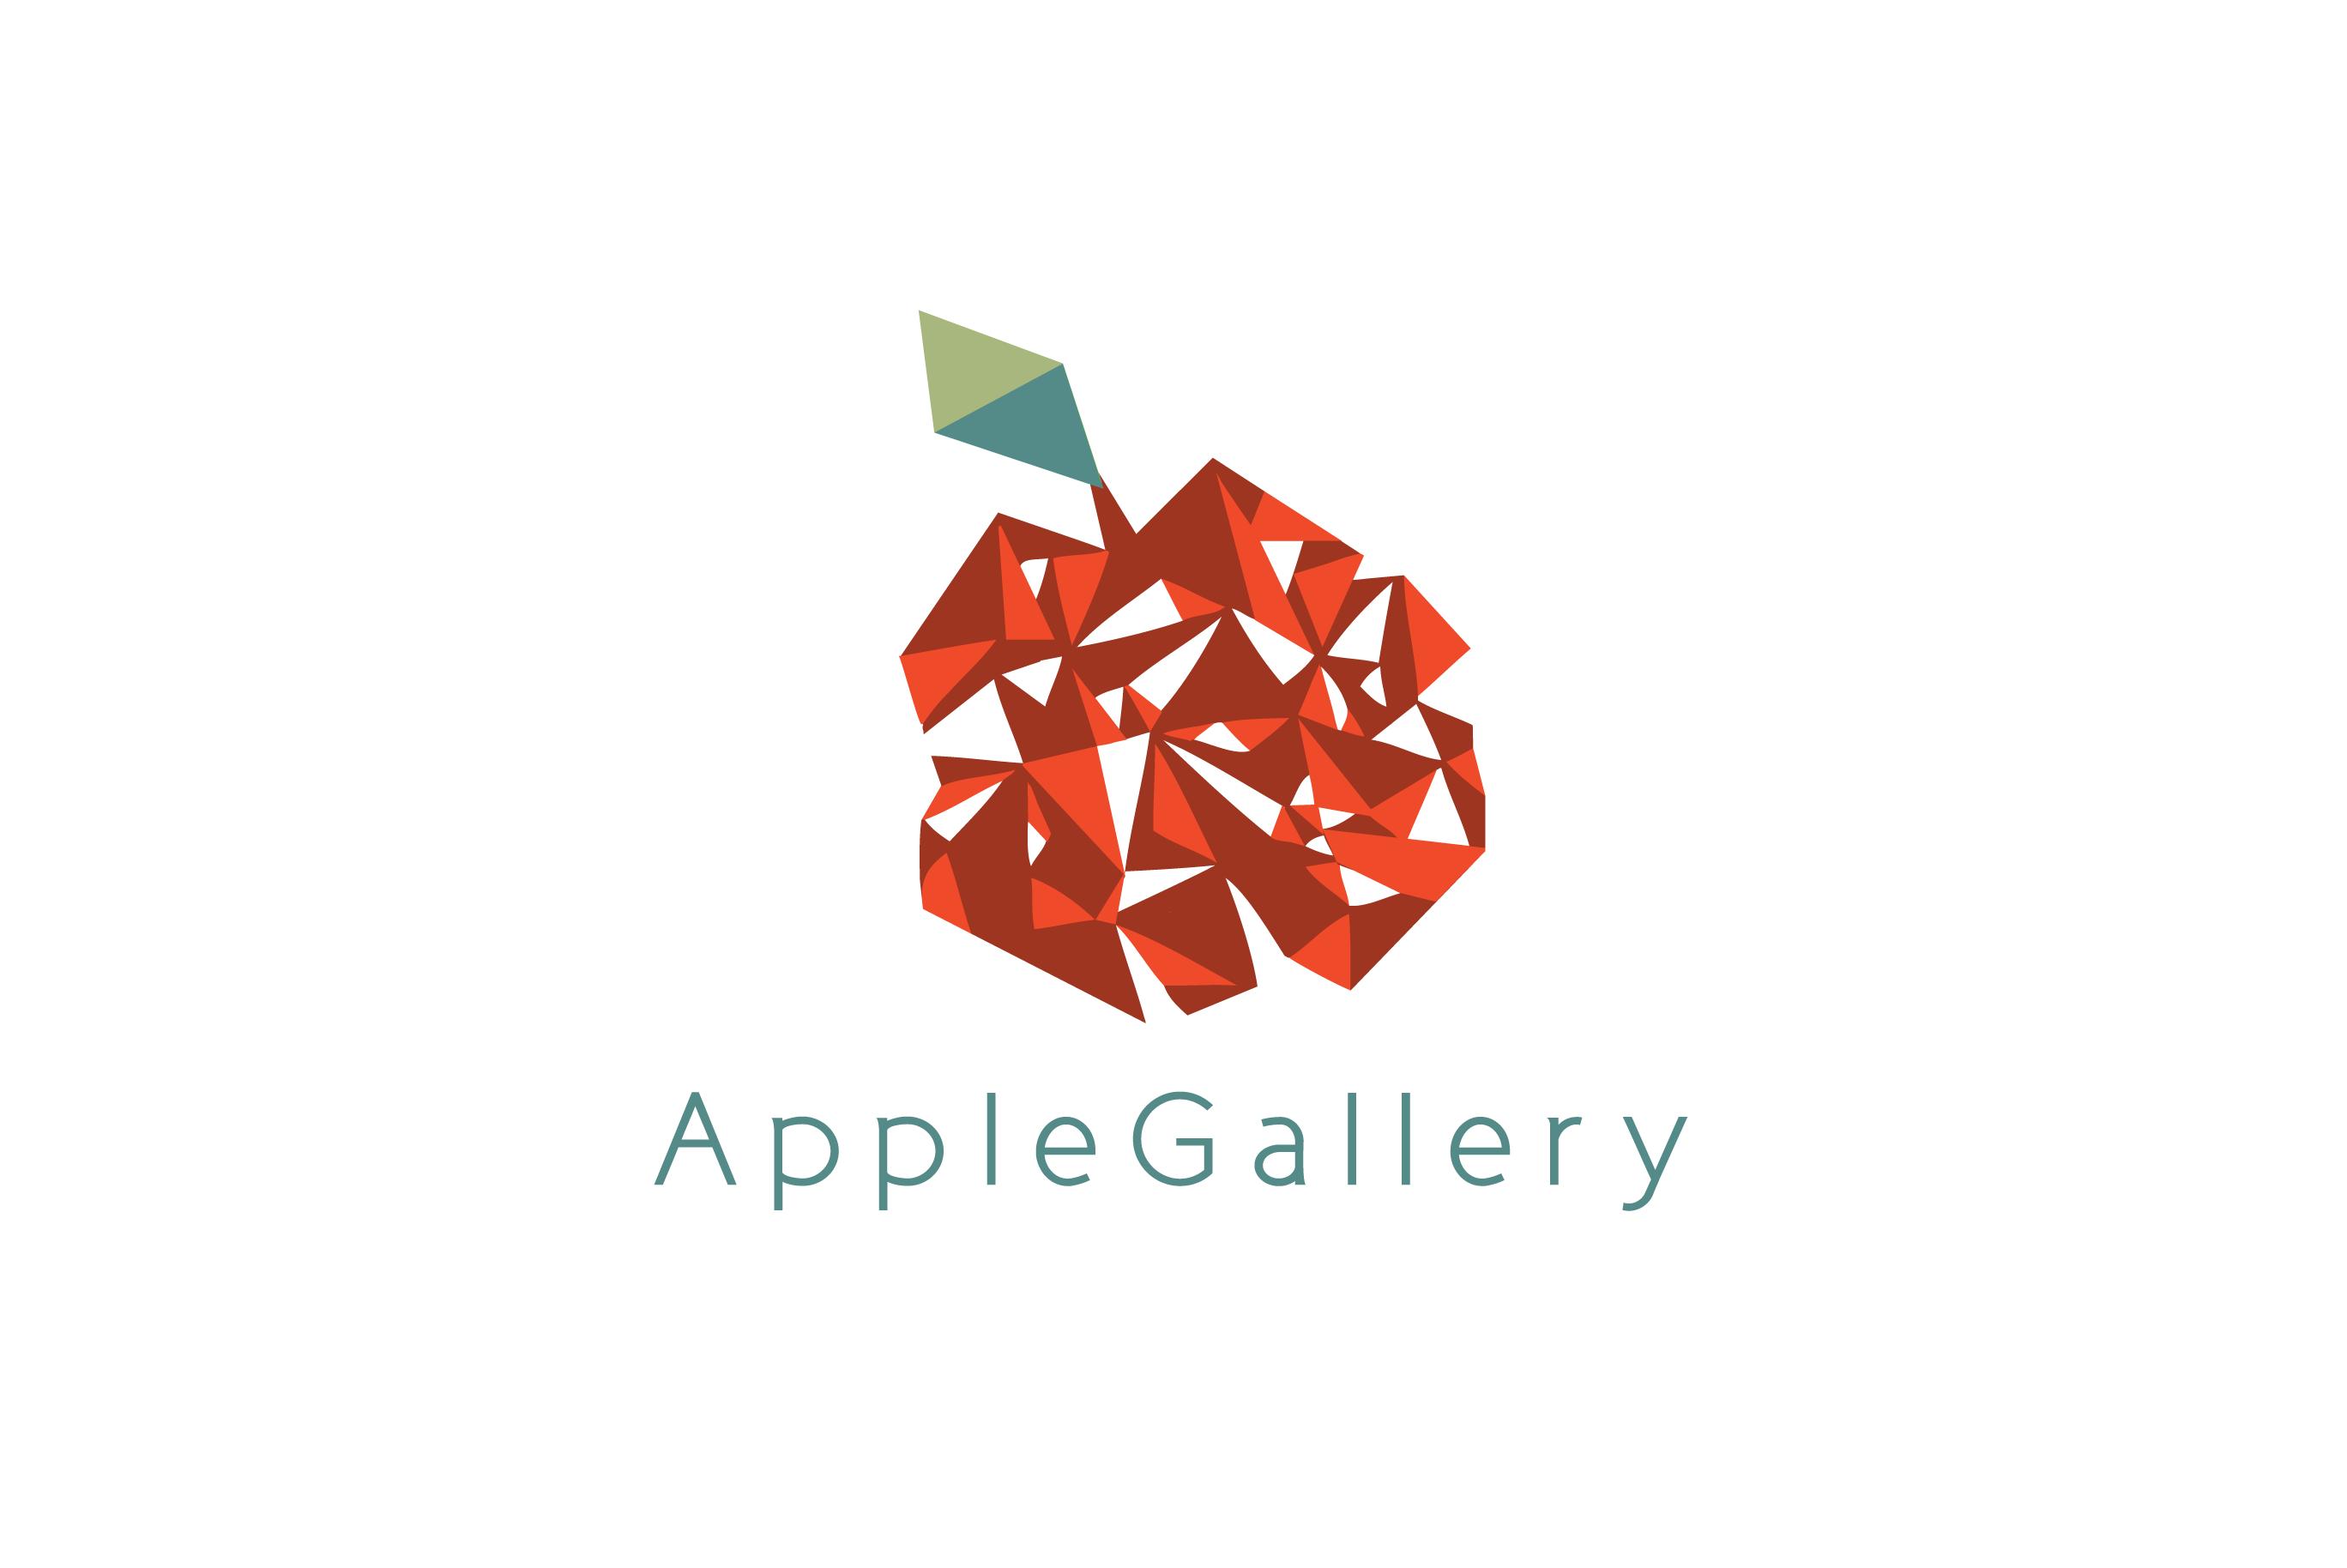 AppleGallery Apple Logo Design.